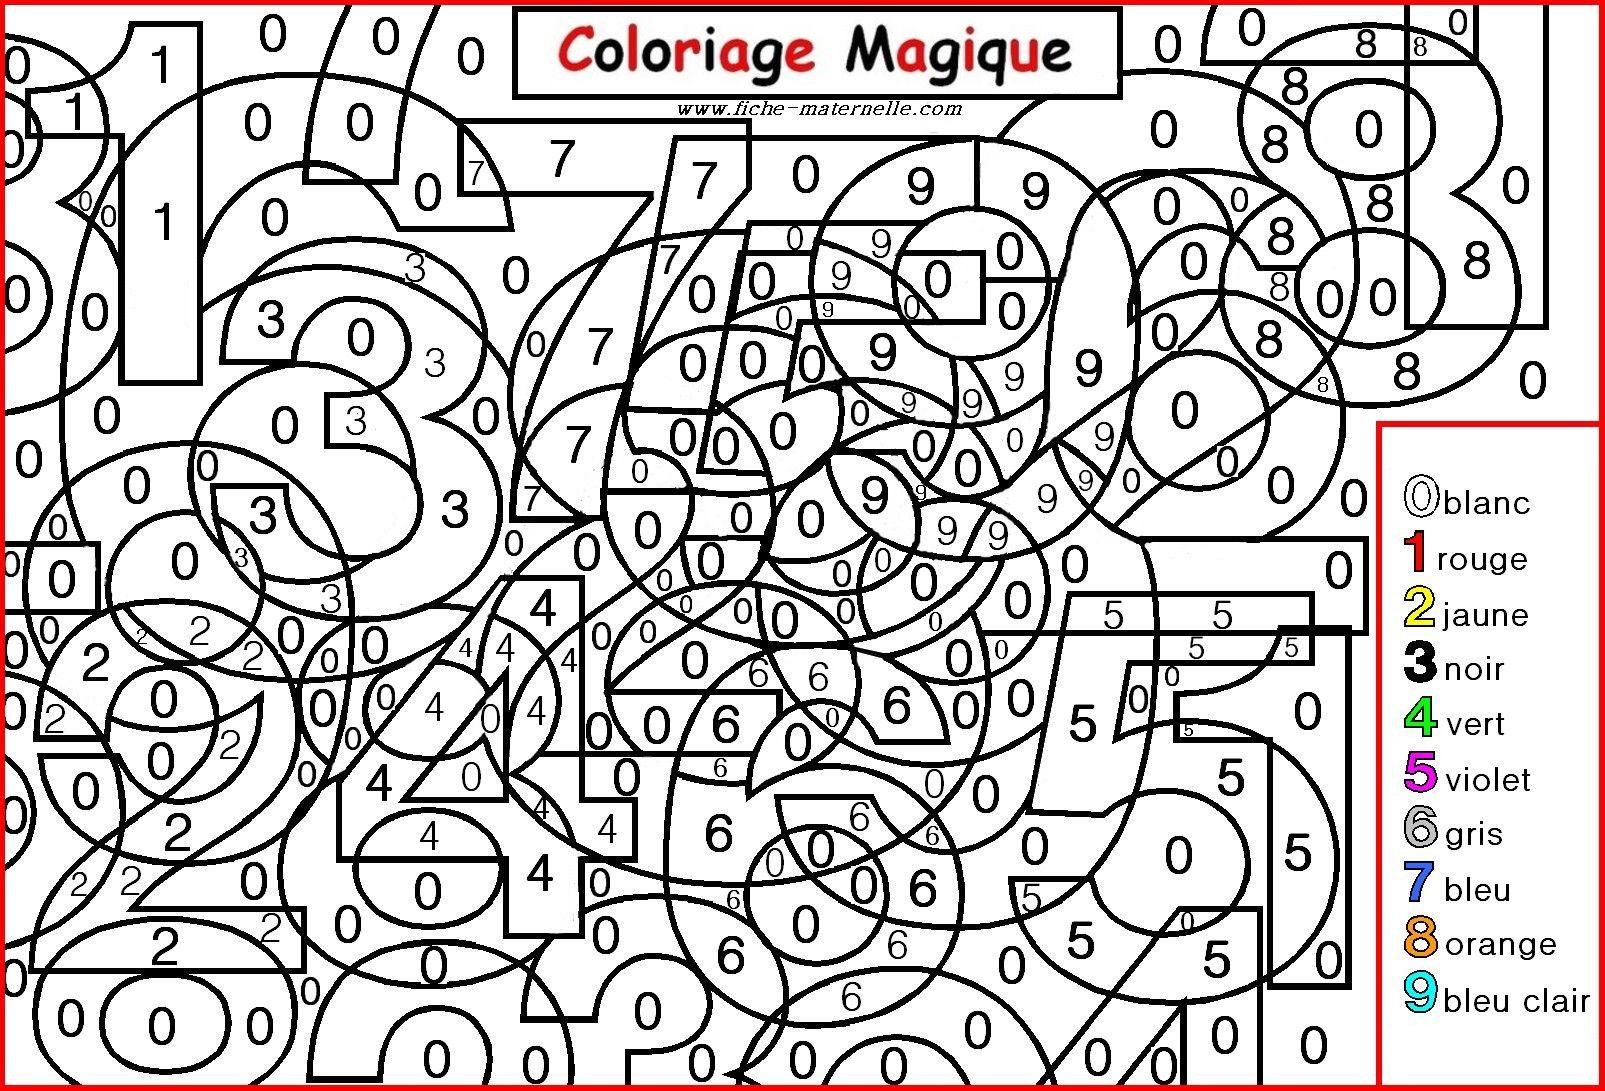 Coloriage Magique Differencier Chiffres 0 A 9